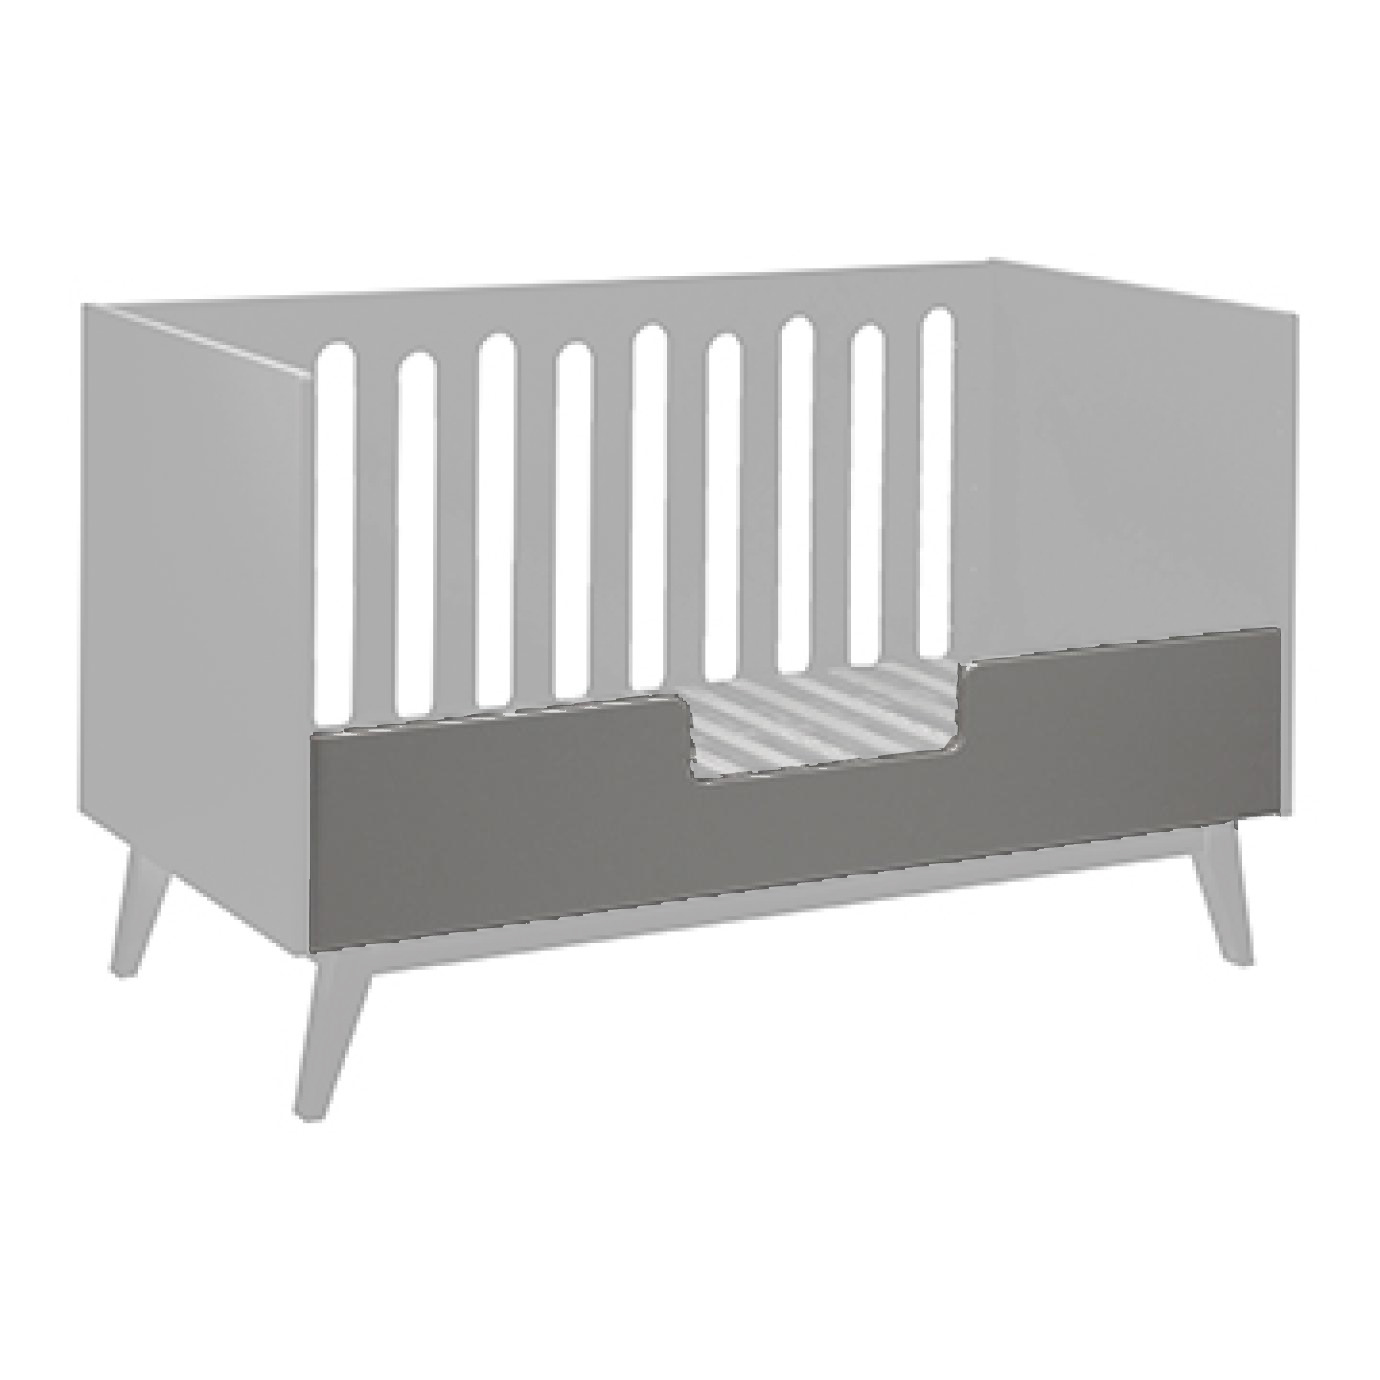 Full Size of Rausfallschutz Kinder Bett Diy Kinderbett Amazon Klappbar Pinolino Babyone 90 Cm Kinderbetten Selber Bauen Ikea Kinderzimmer Regal Betten Wohnzimmer Rausfallschutz Kinder